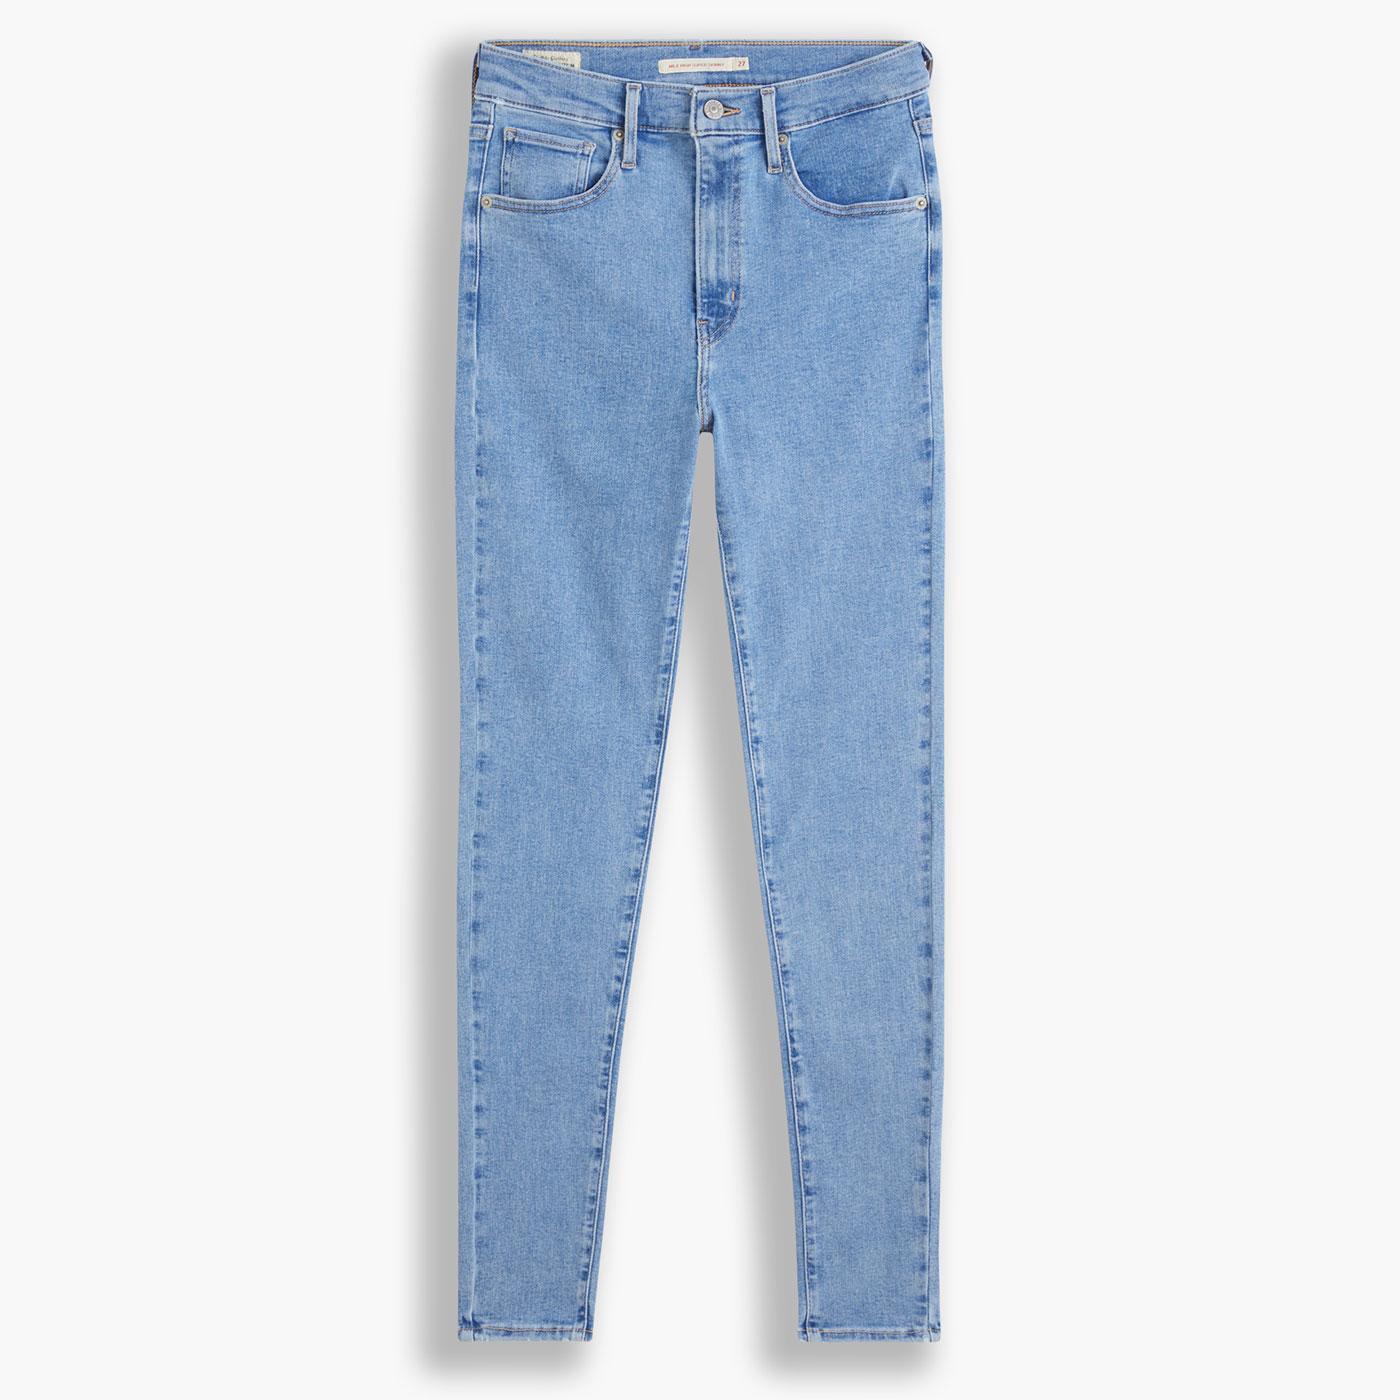 LEVI'S Mile High Women's Super Skinny Jeans (NS)